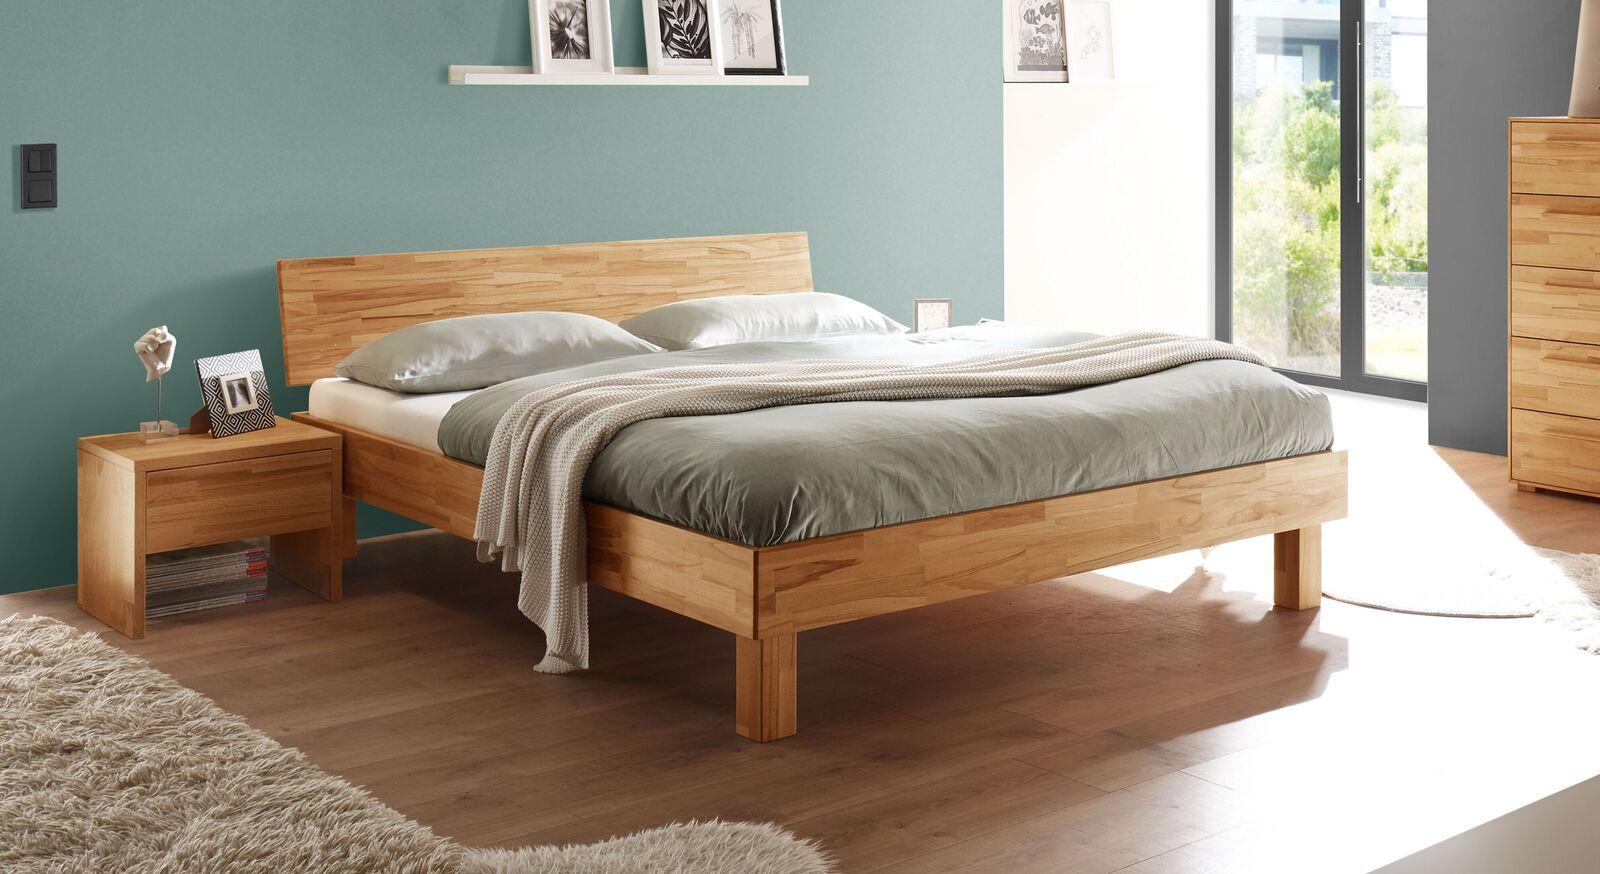 Bett Varion in klassischem Design